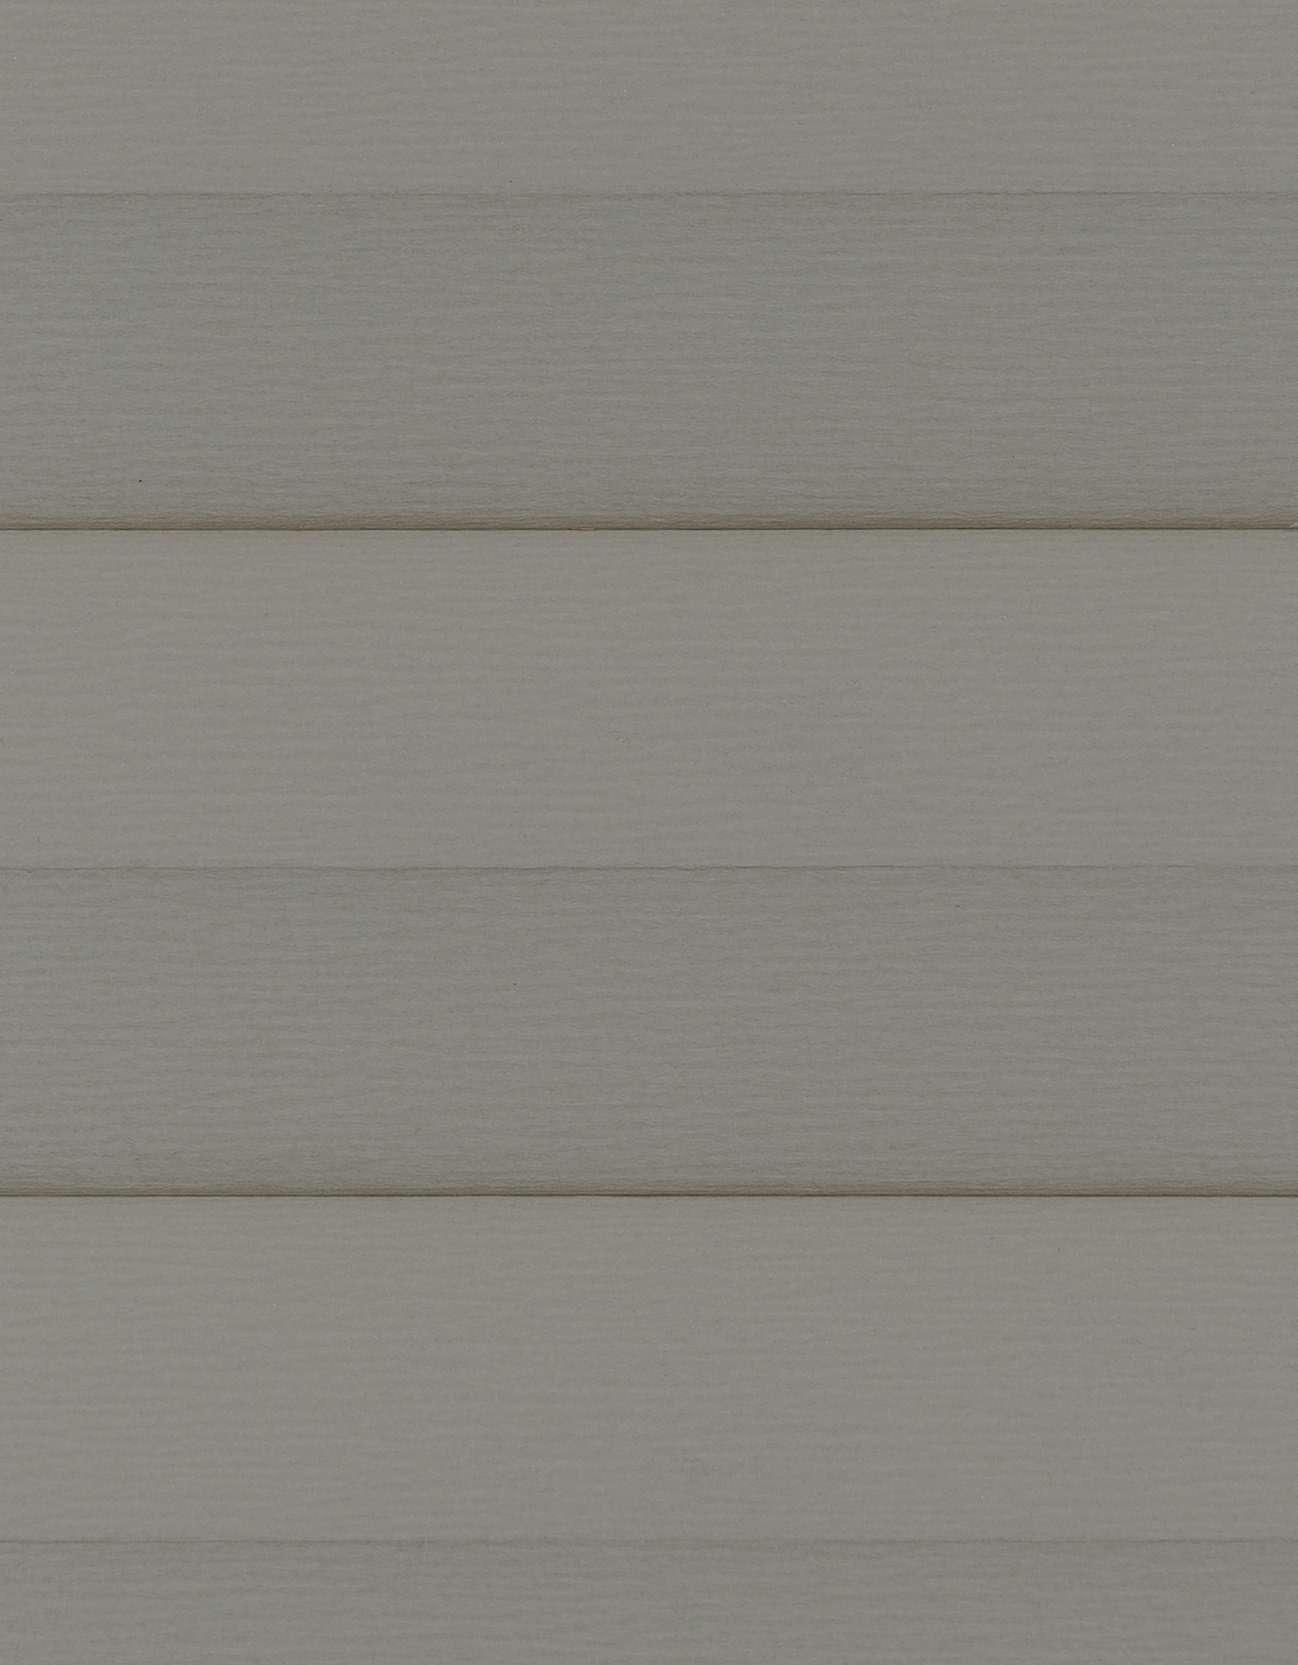 Semi-transparant Dupligordijnen 45 mm Kleurstaal Lichen